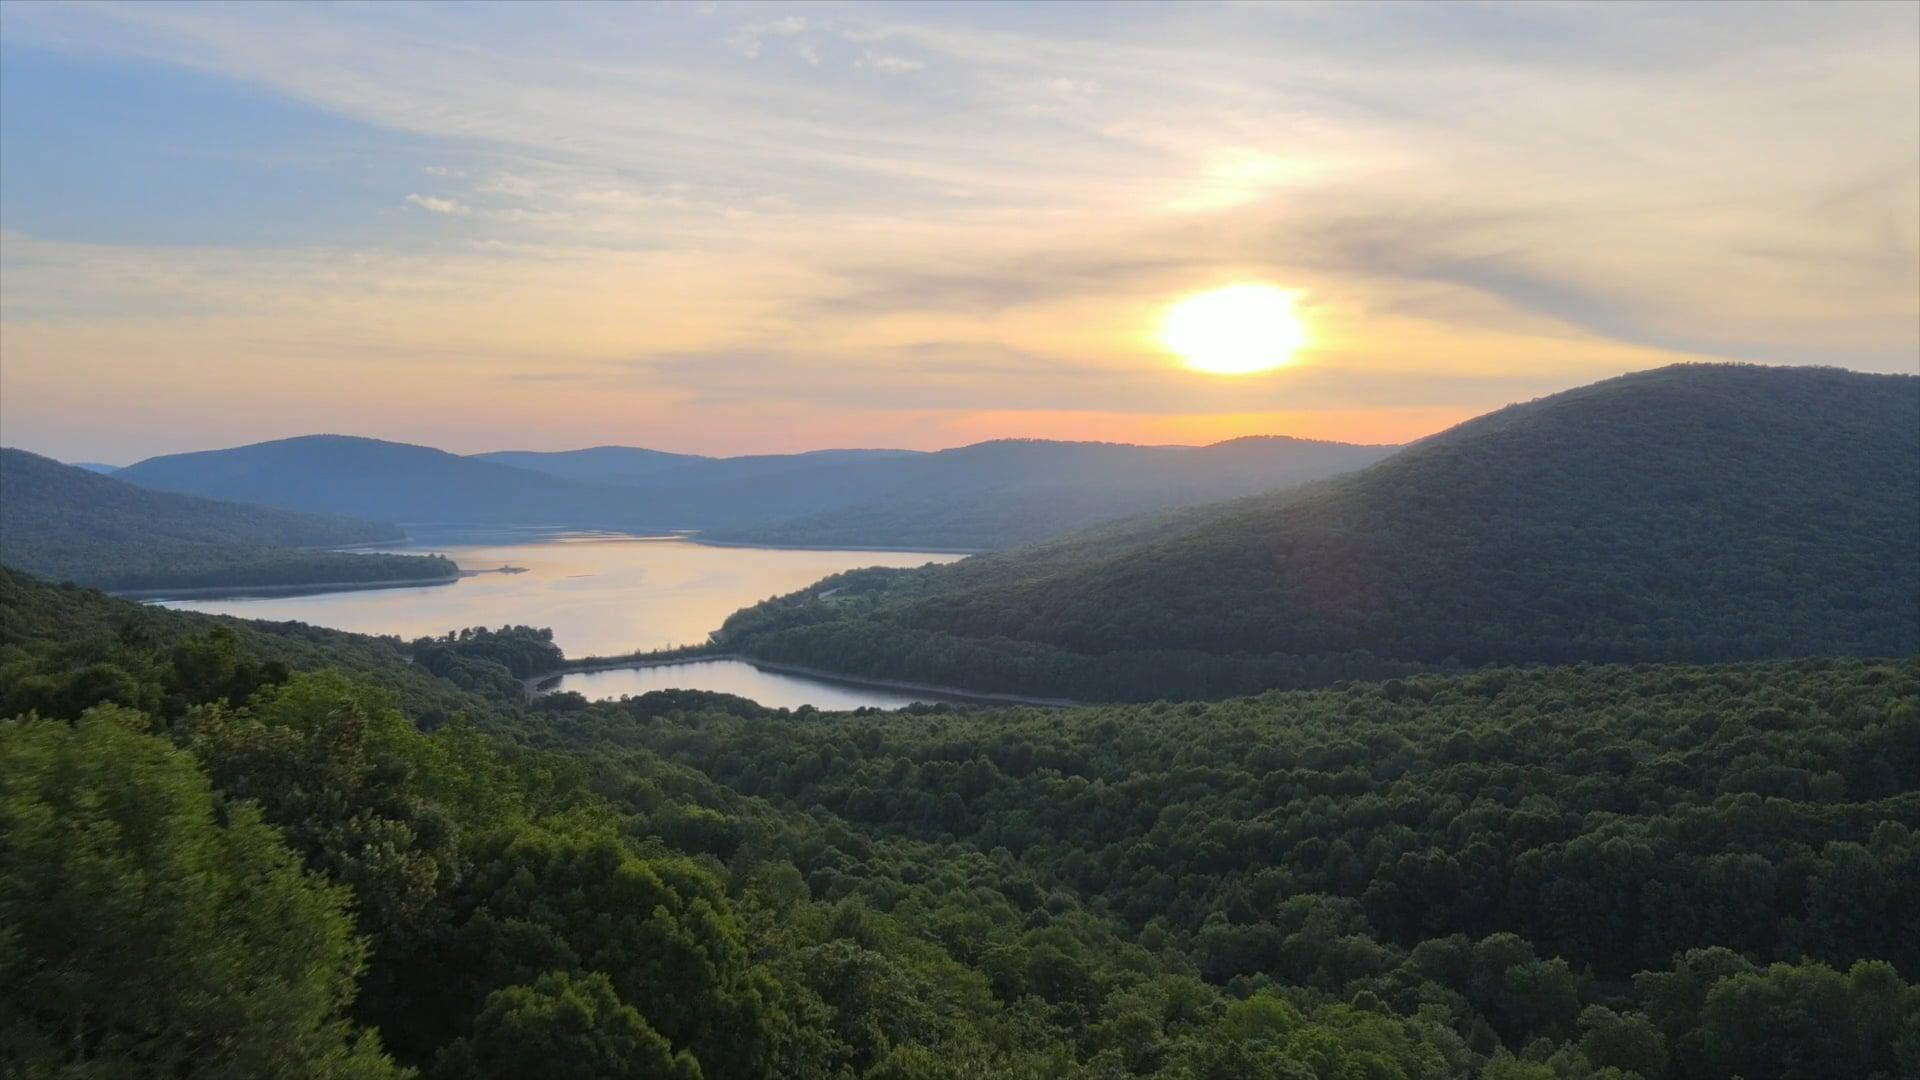 Take me home, Mountain Drone Footage